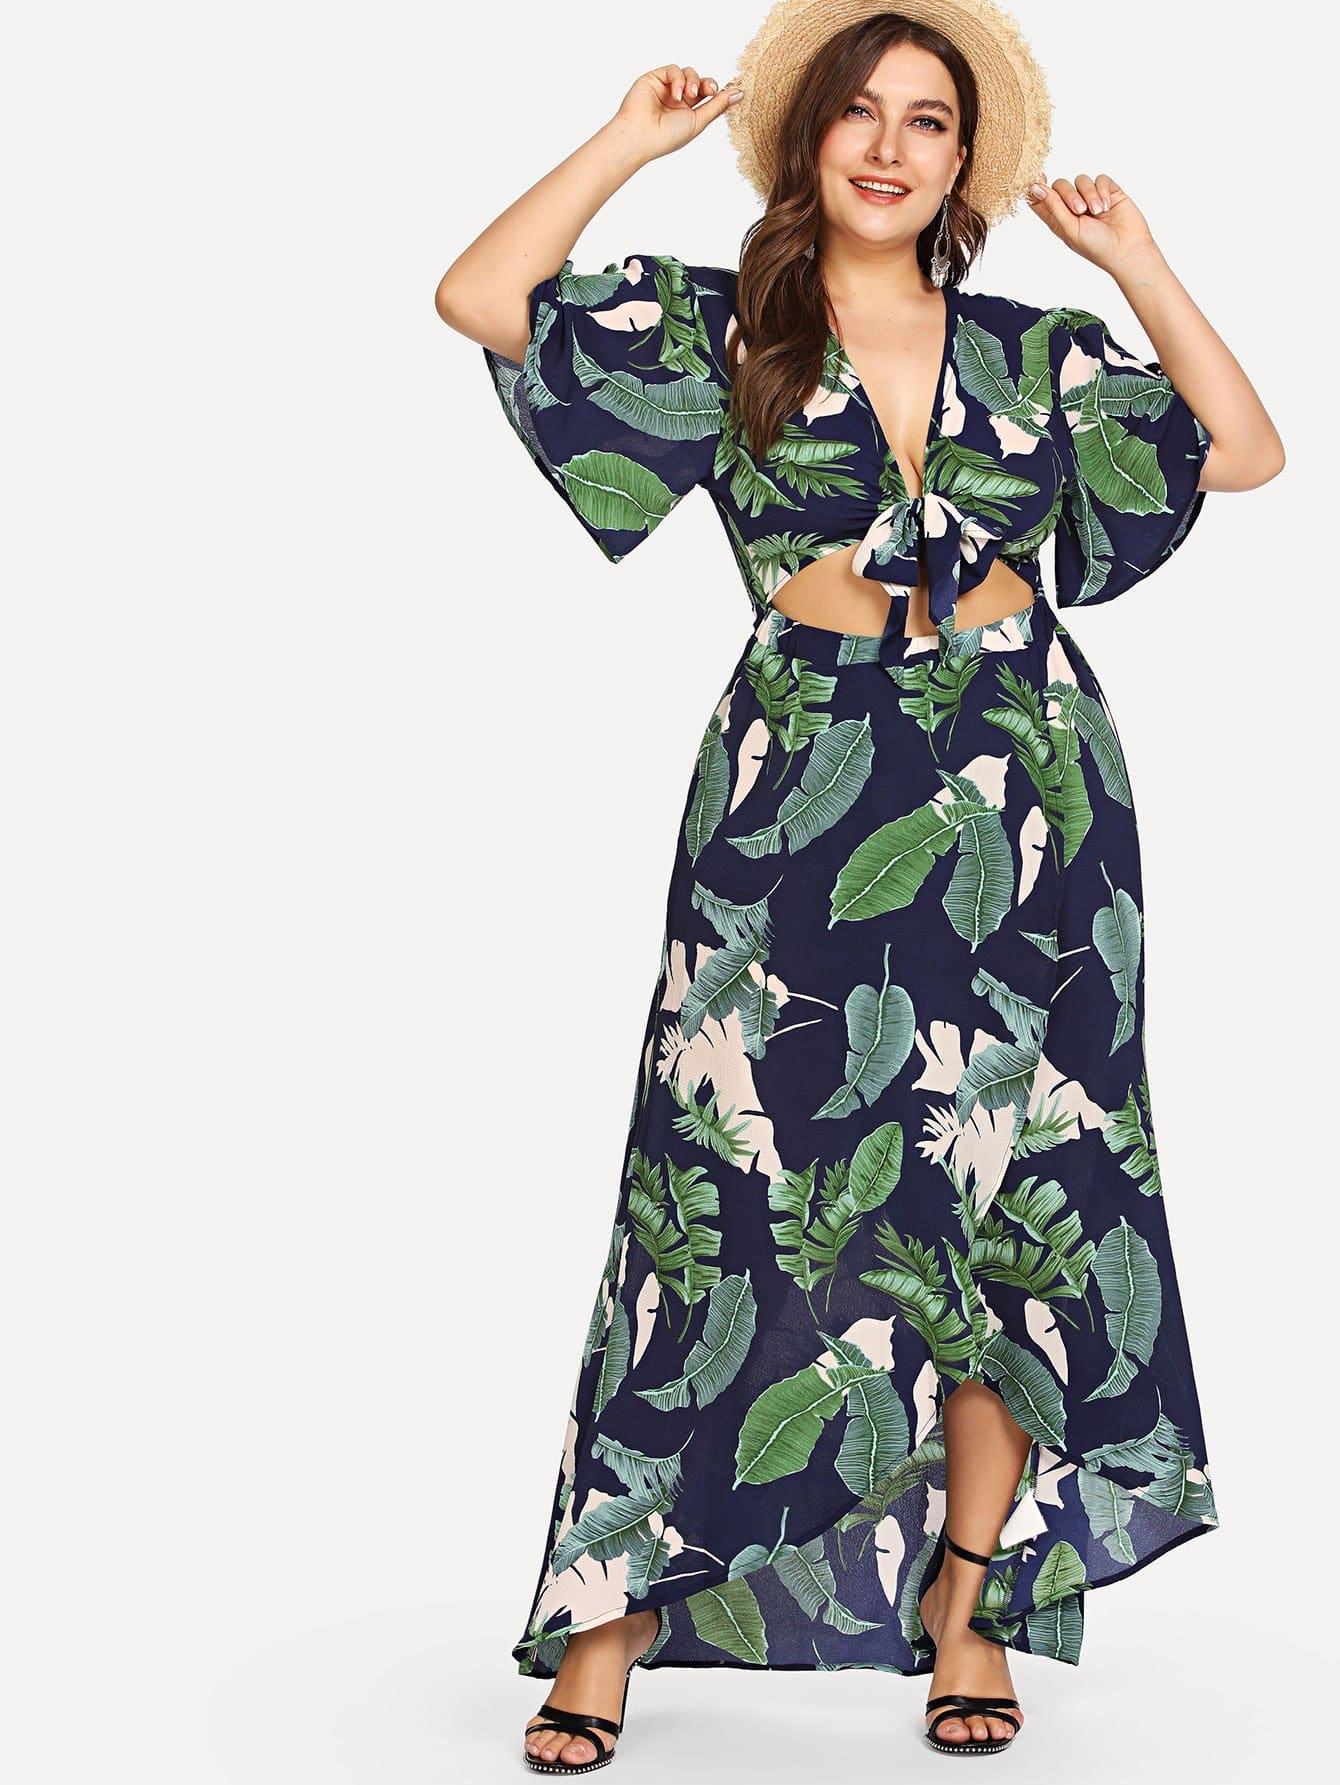 Plus Knot Front Cutout Midriff Tropical Dress knot front cutout midriff halterneck gingham dress